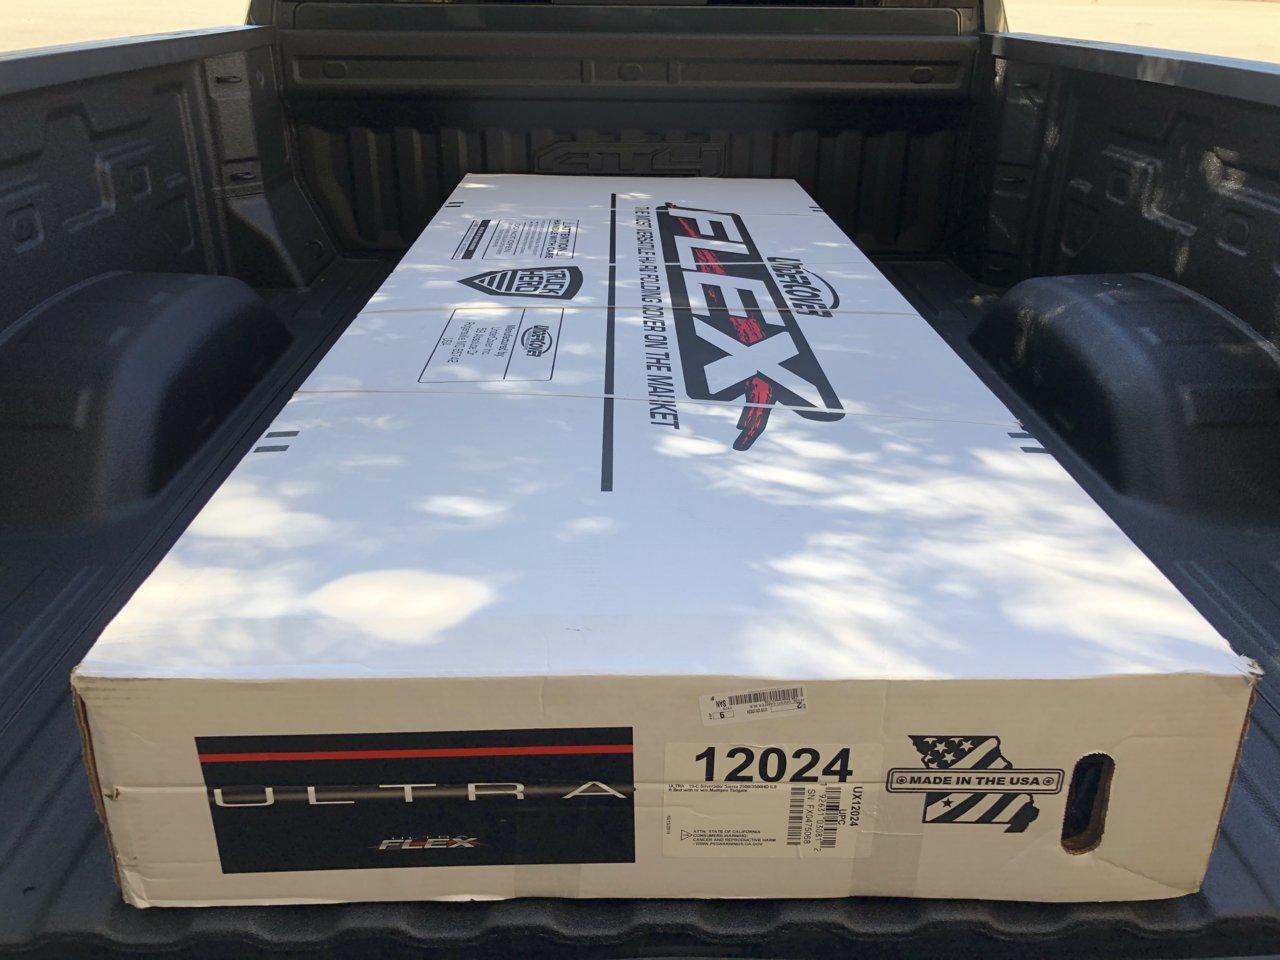 4A9A2ED9-5CFE-462D-8DCB-EFFC83F81FB7.jpg